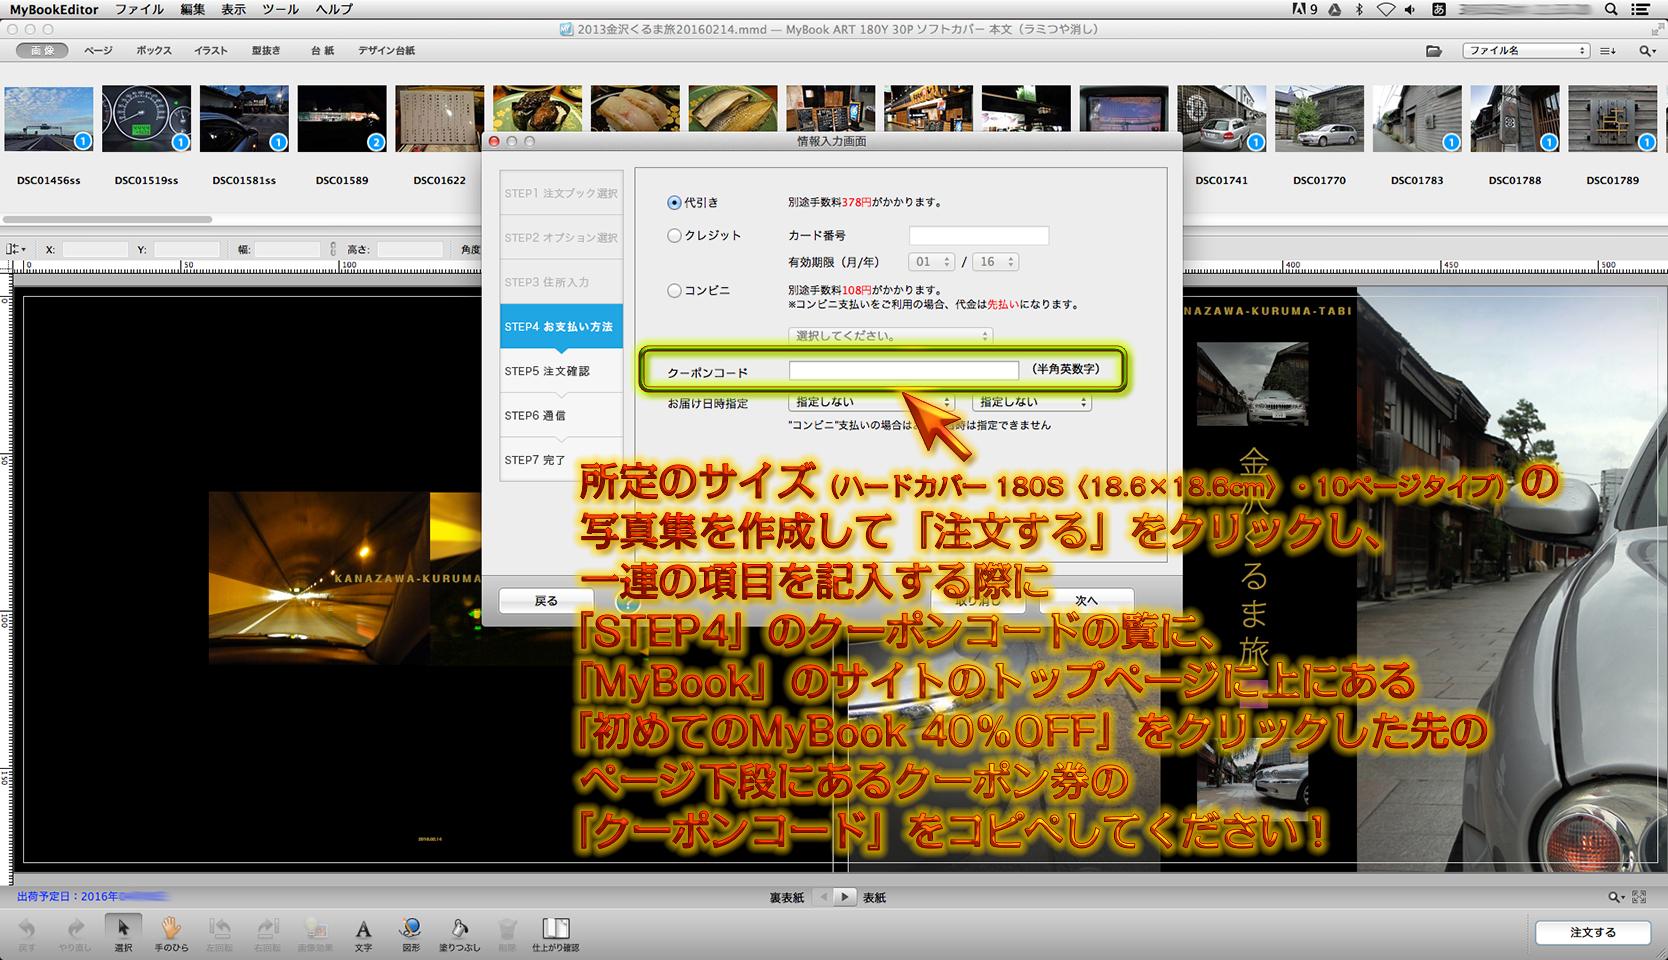 http://moritetsu.info/car/img/mb205-2016-03-31-11-33-20.jpg